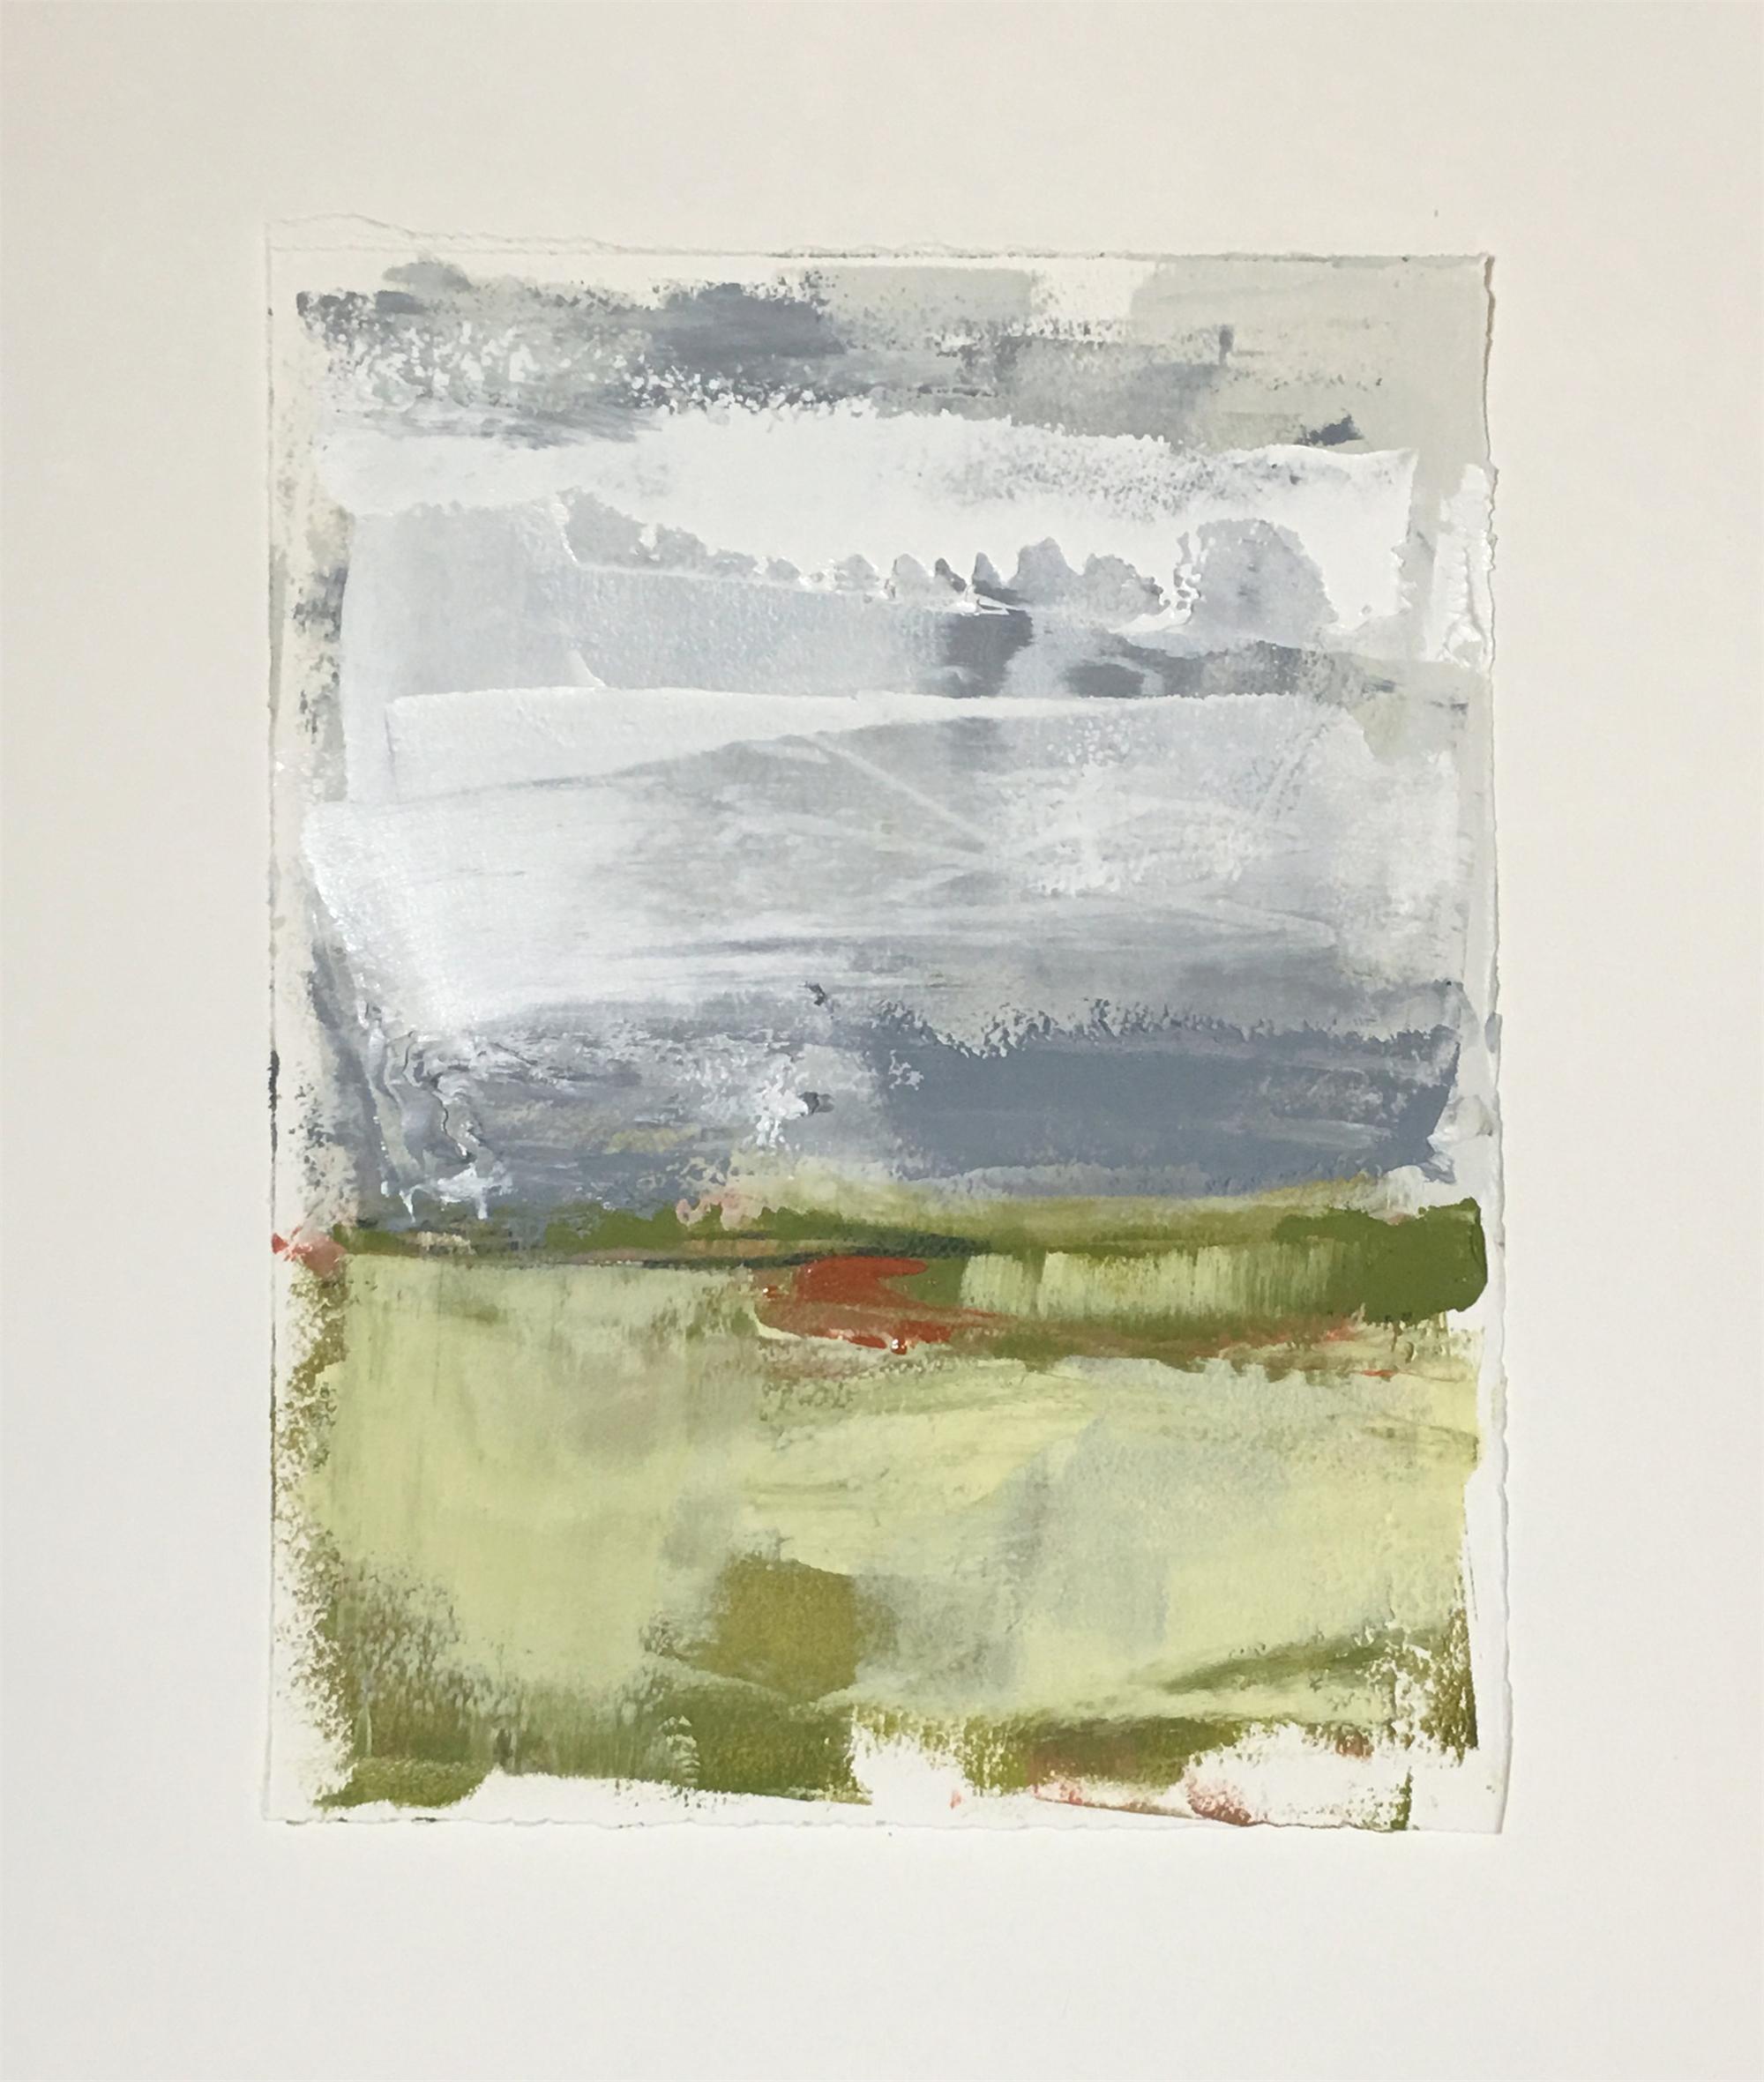 Untitled (Landscape III) by Lynn Johnson